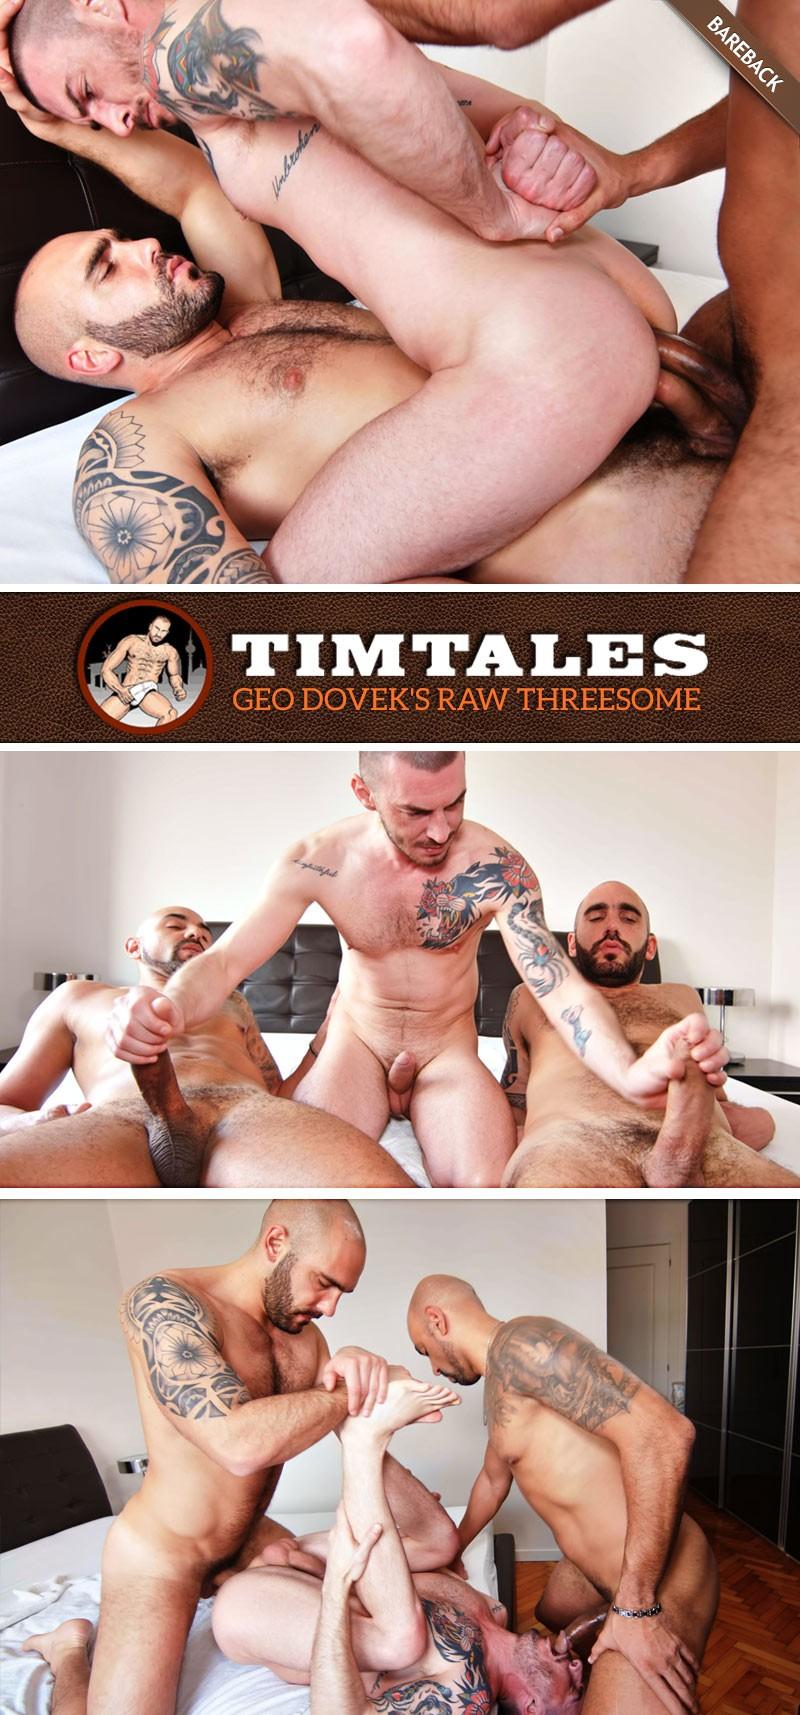 TimTales - Geo Dovek's Raw Threesome with Adam Sahar and Francisco Sants